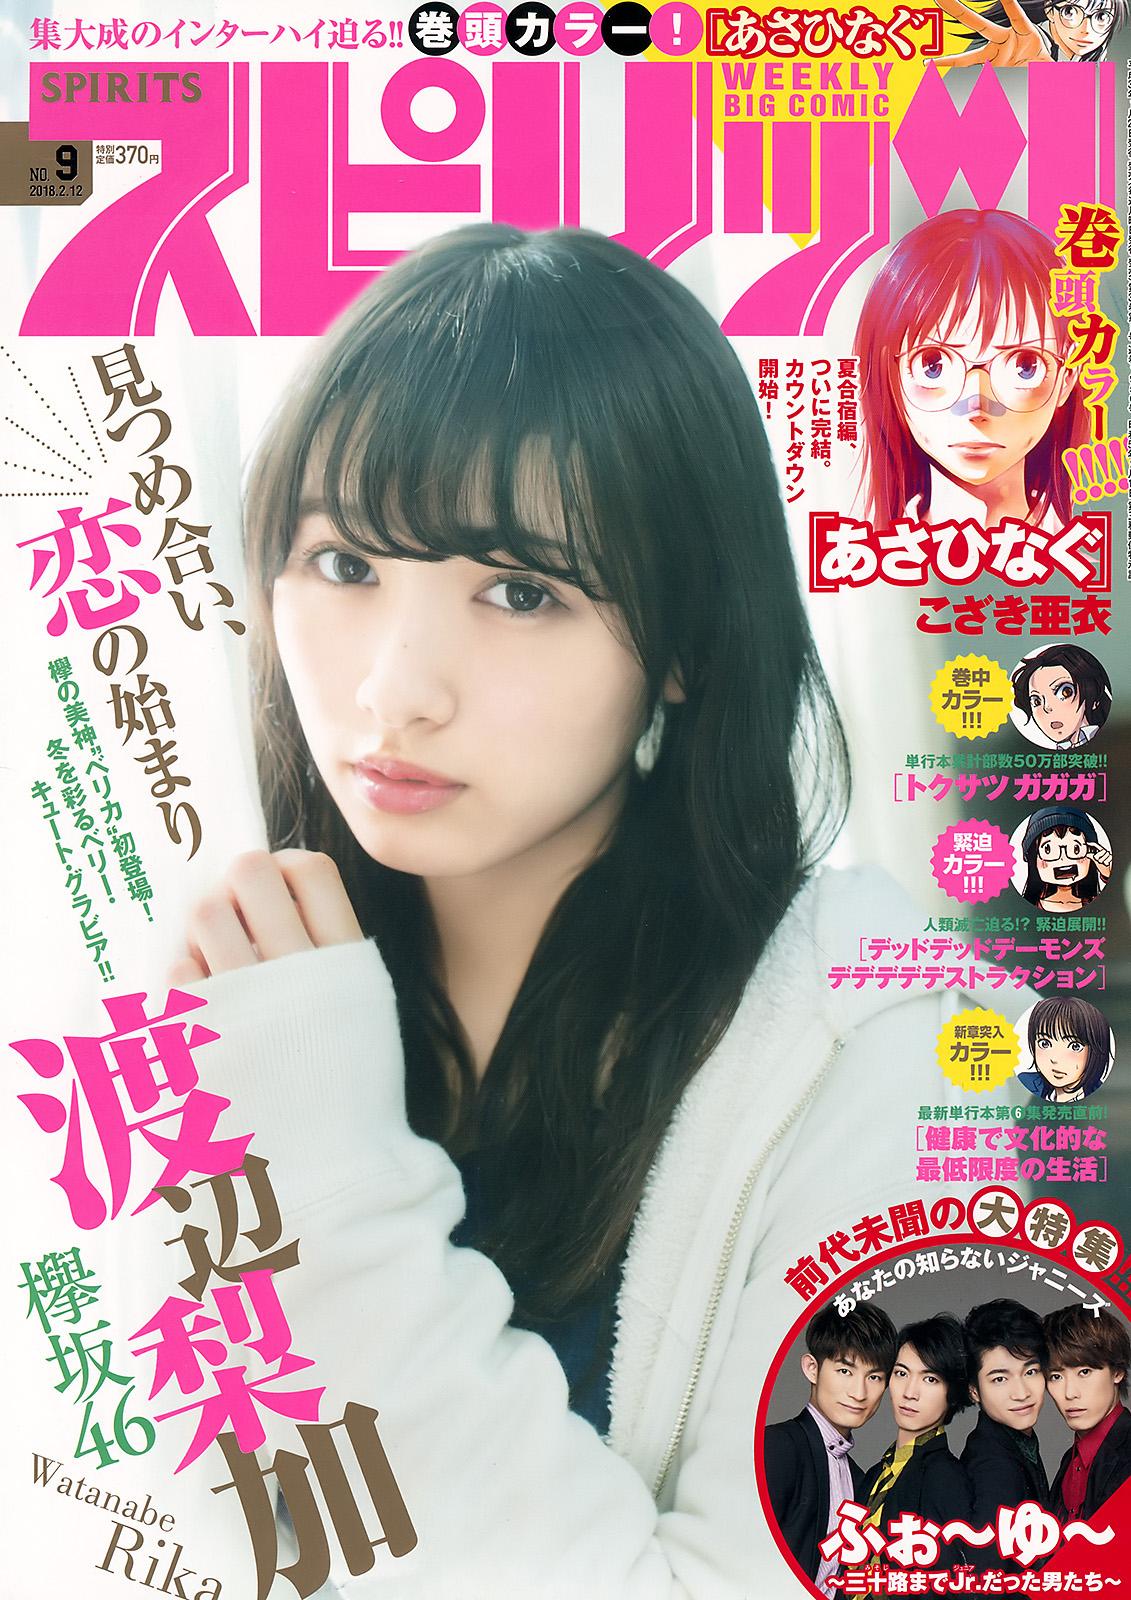 Watanabe Rika 渡辺梨加, Big Comic Spirits 2018 No.09 (週刊スピリッツ 2018年09号)